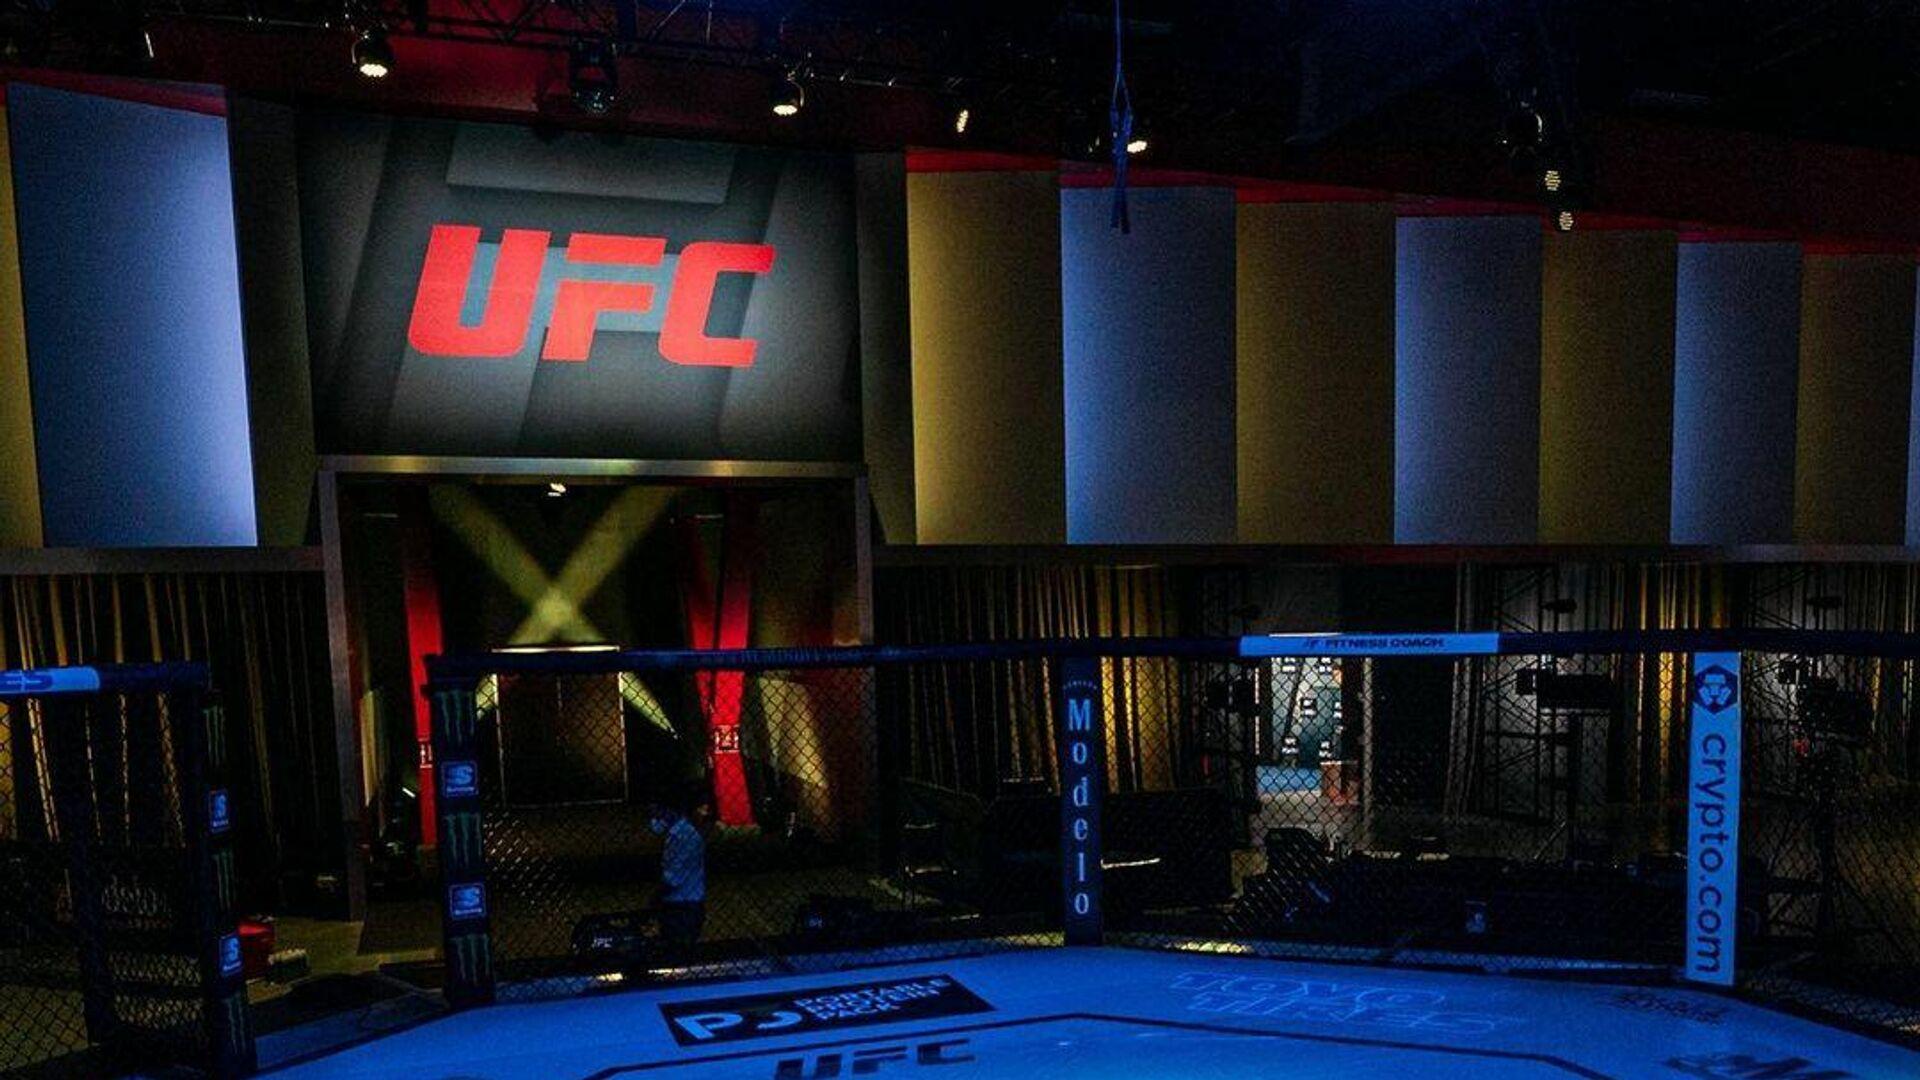 Октагон UFC - РИА Новости, 1920, 25.07.2021